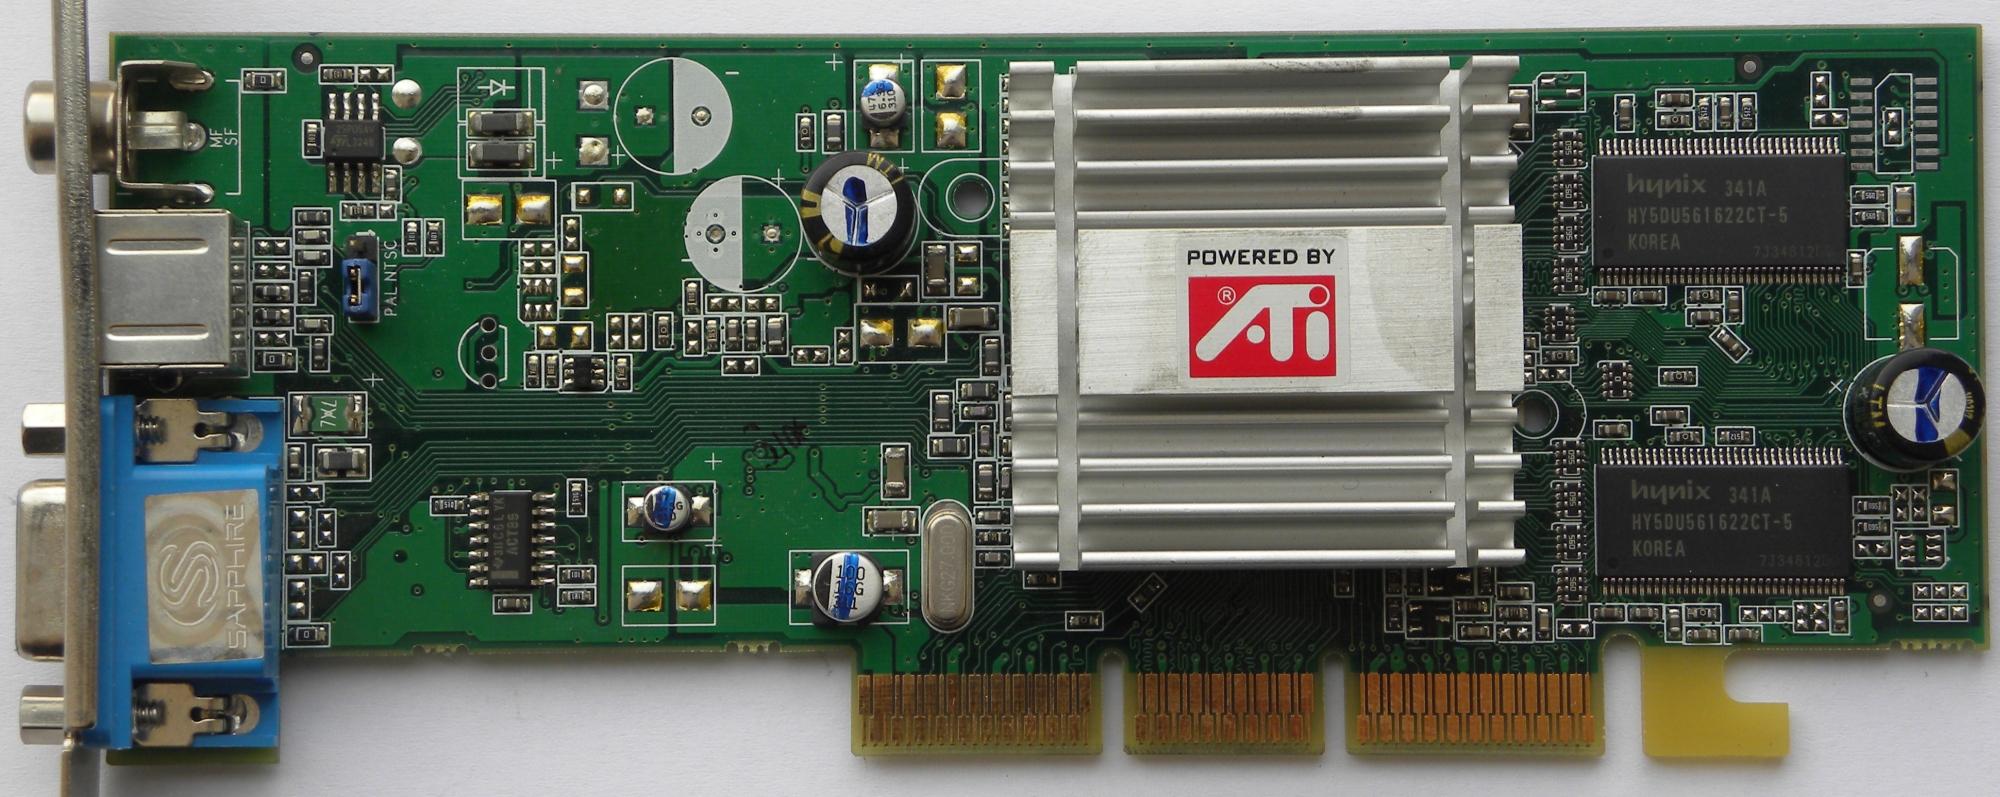 Ati Radeon Hd 5570 Driver Download Windows Xp 32 Bit